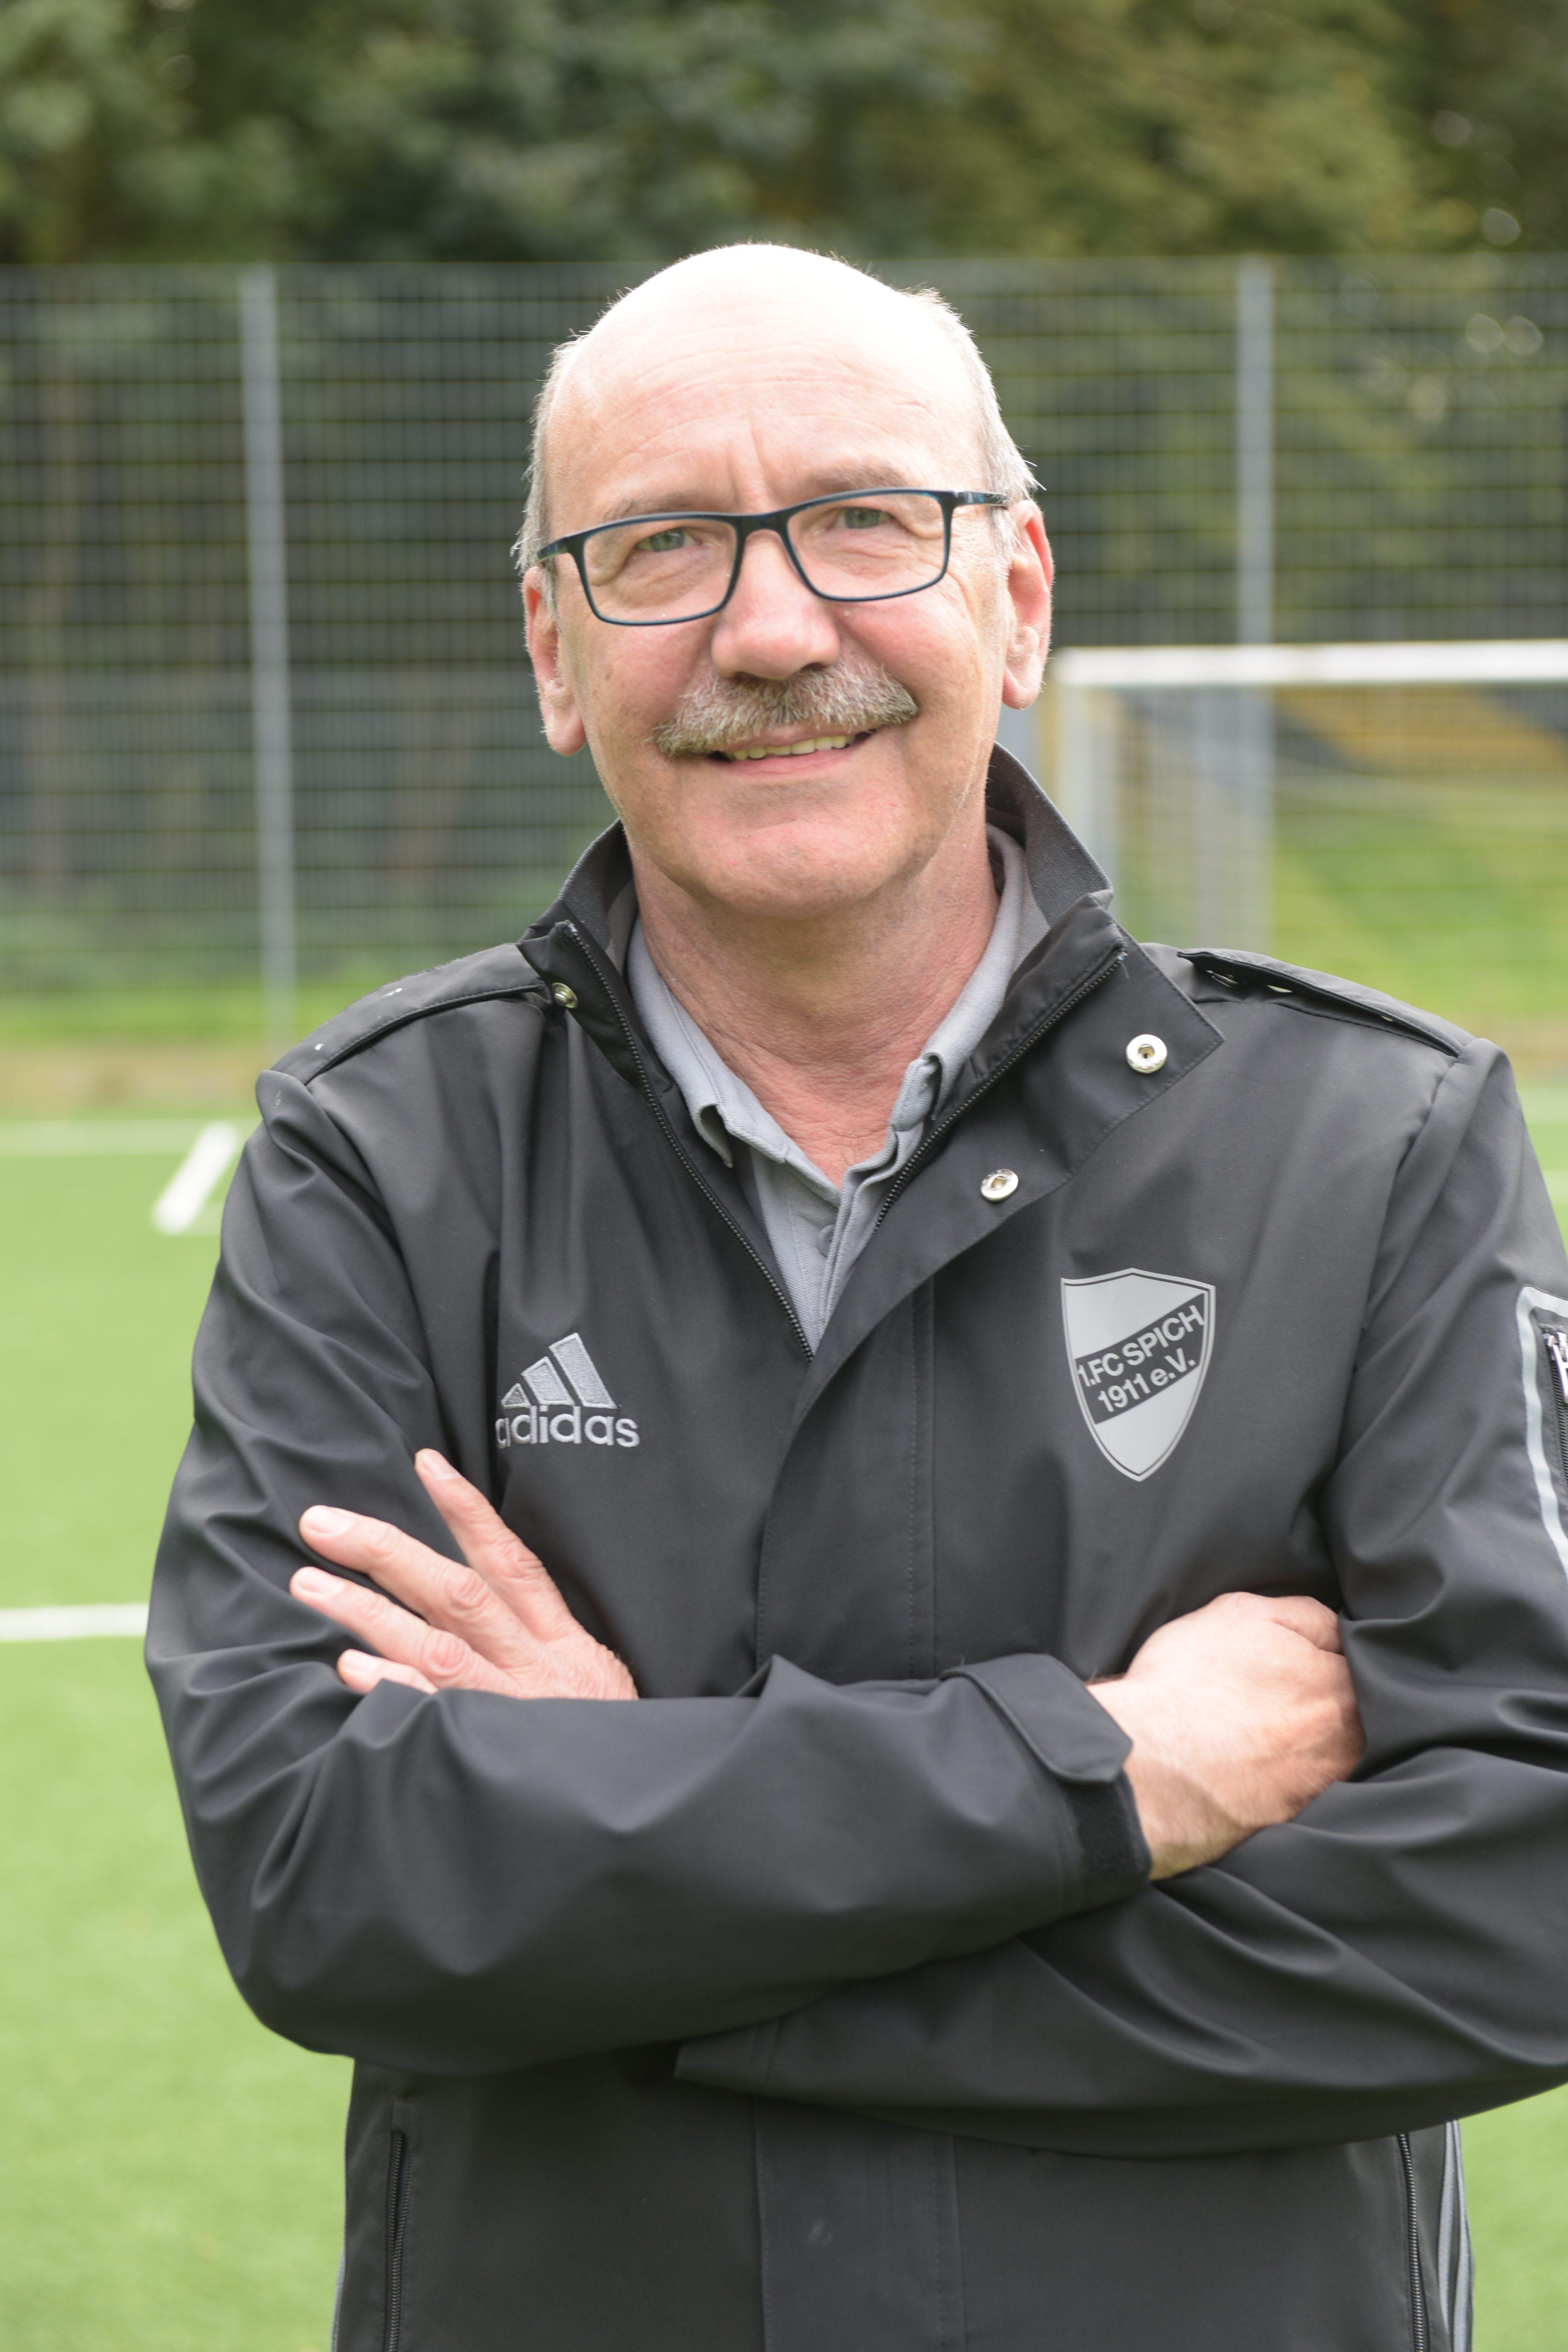 Werner Ulkann